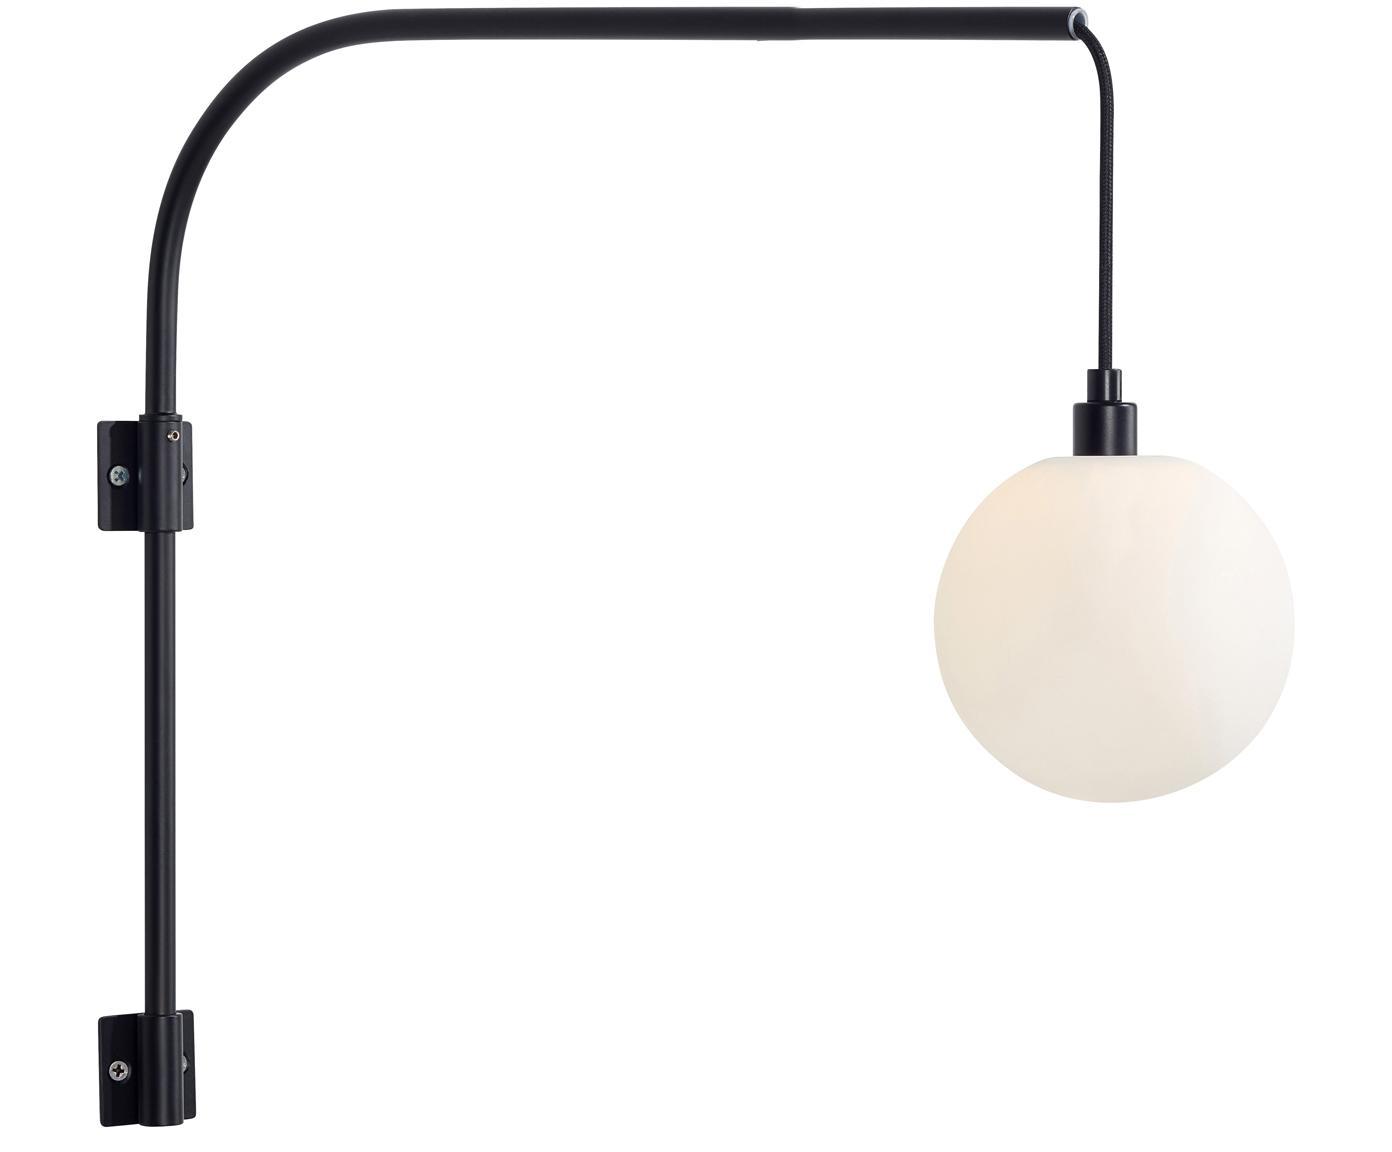 Wandleuchte Buddy, Lampenschirm: Opalglas, Schwarz, 12 x 41 cm